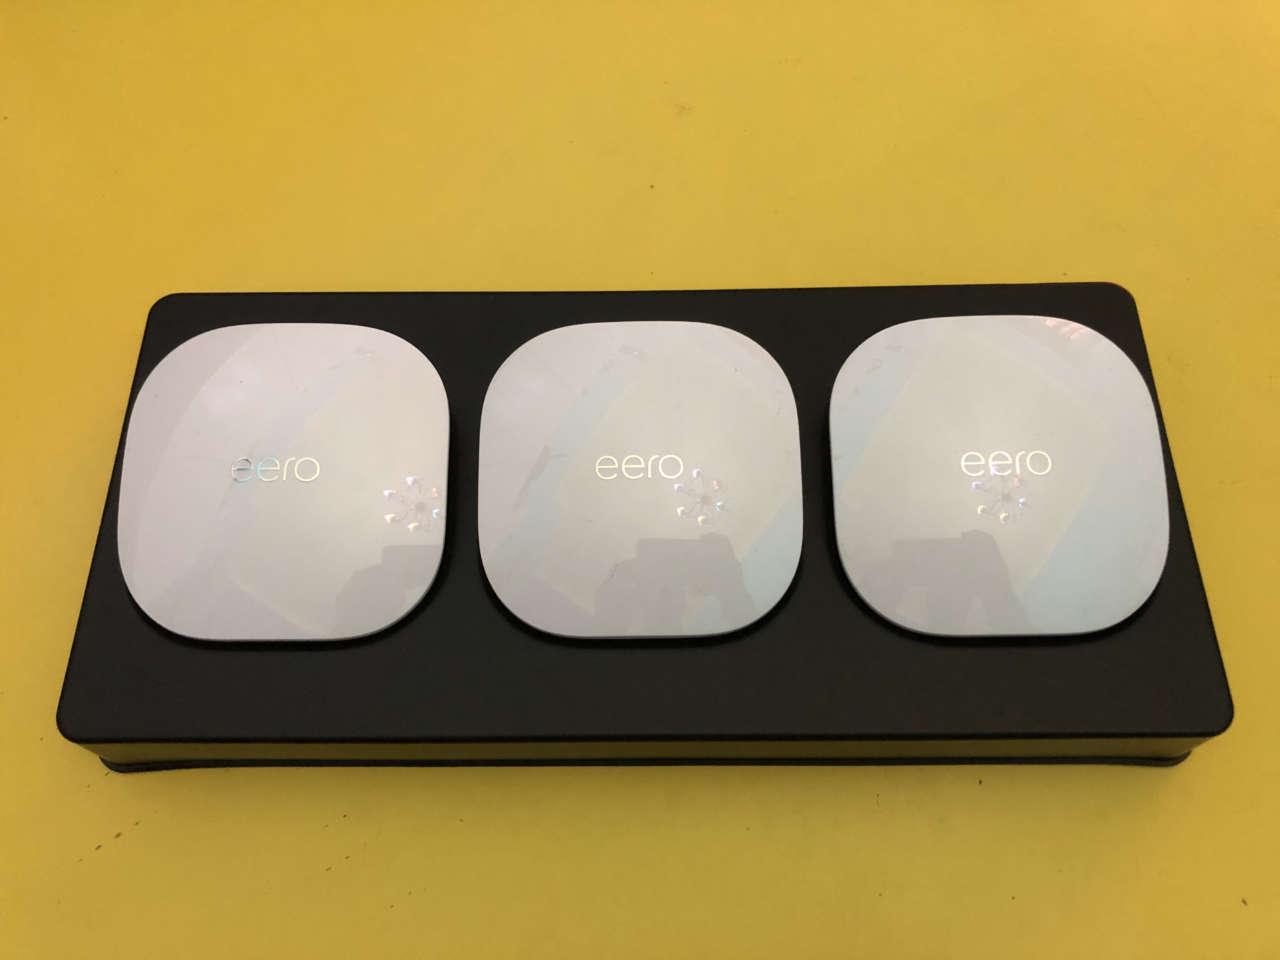 eero Home Wi-Fi System - Kit